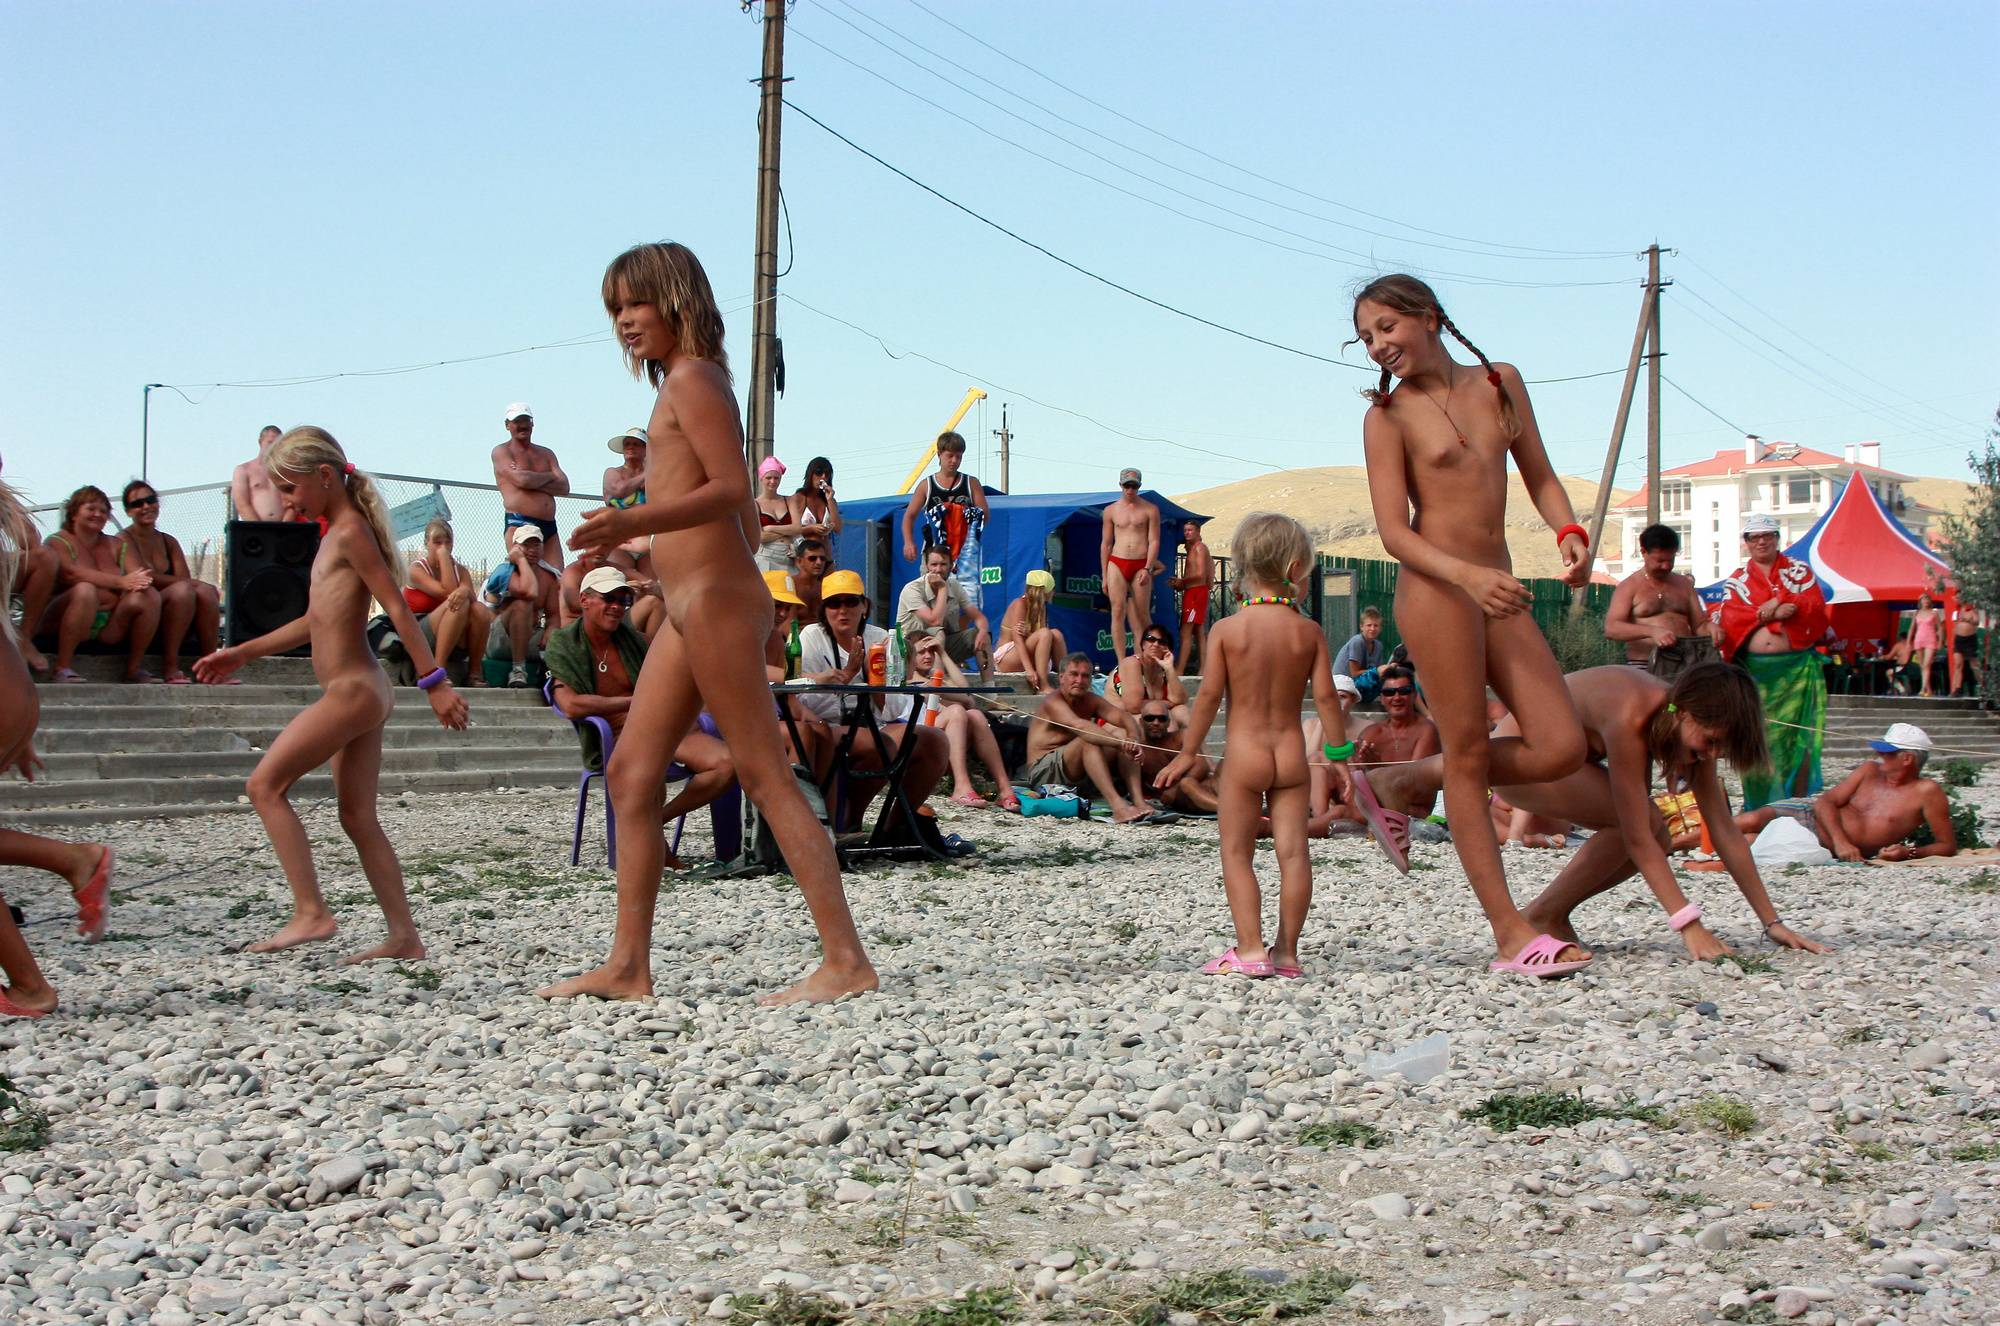 Purenudism Photos Nude Contestant Walk-Off - 1